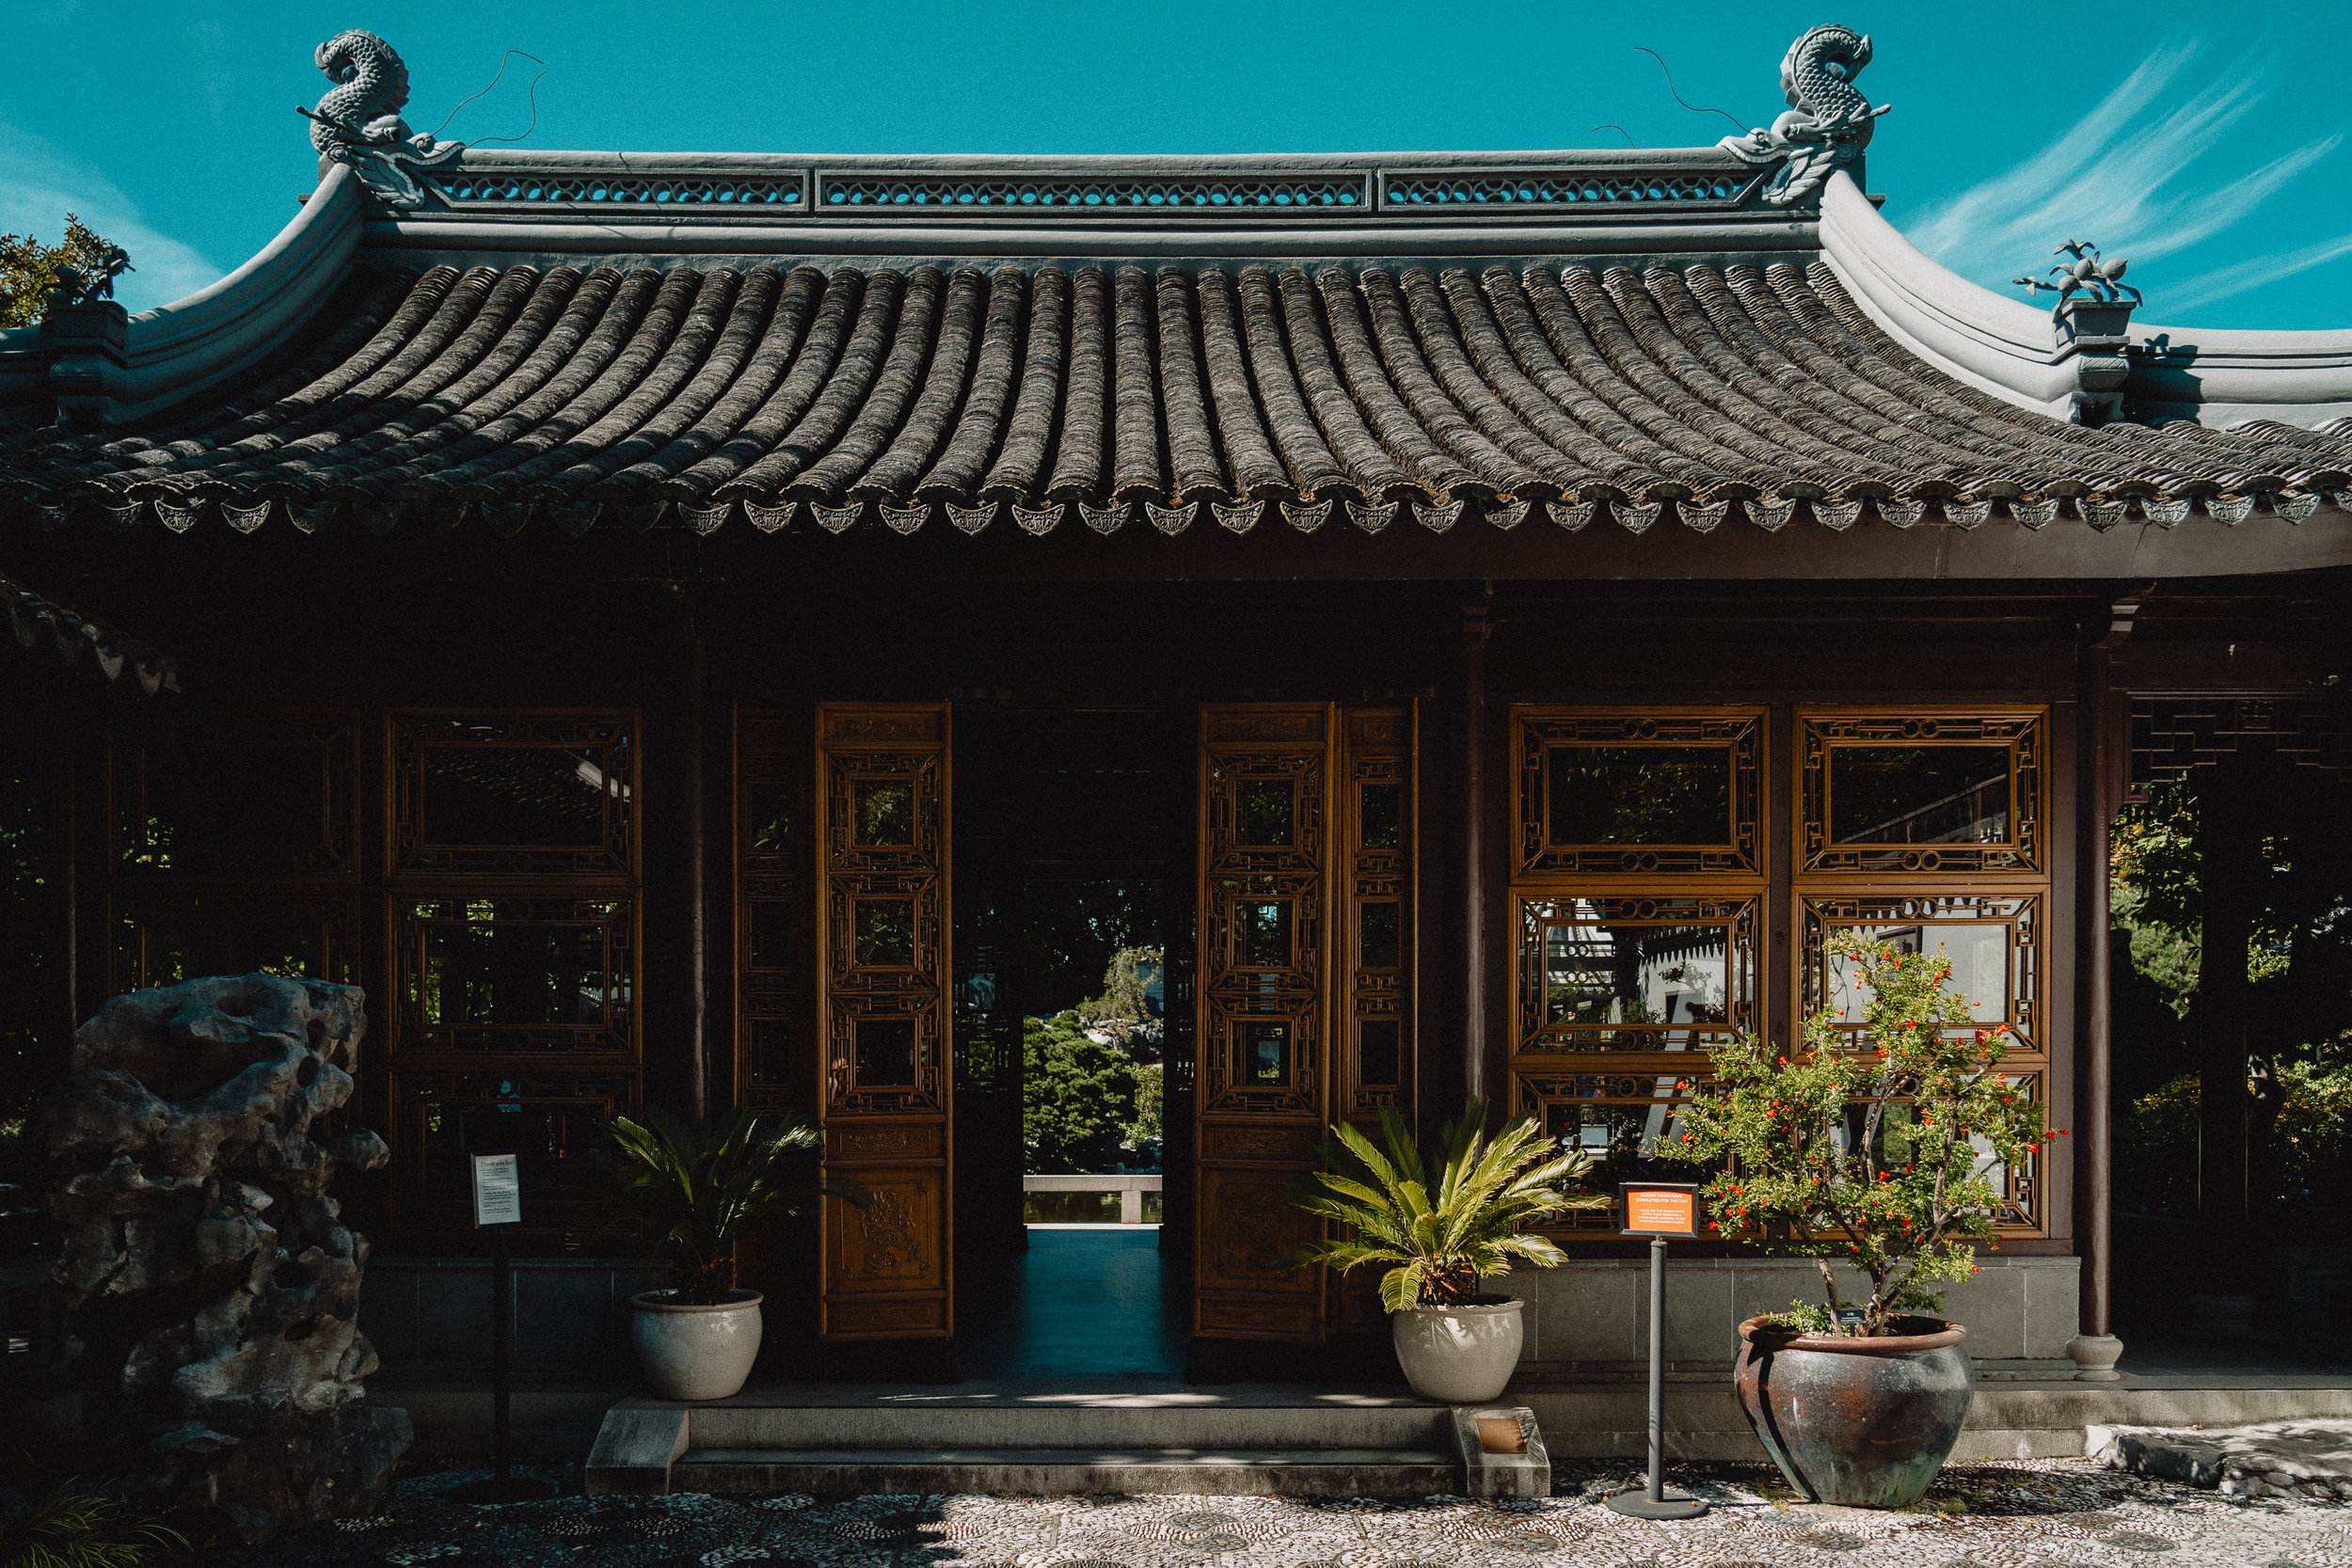 Personal work shot at Lan Su Chinese Garden, in Portland, OR.